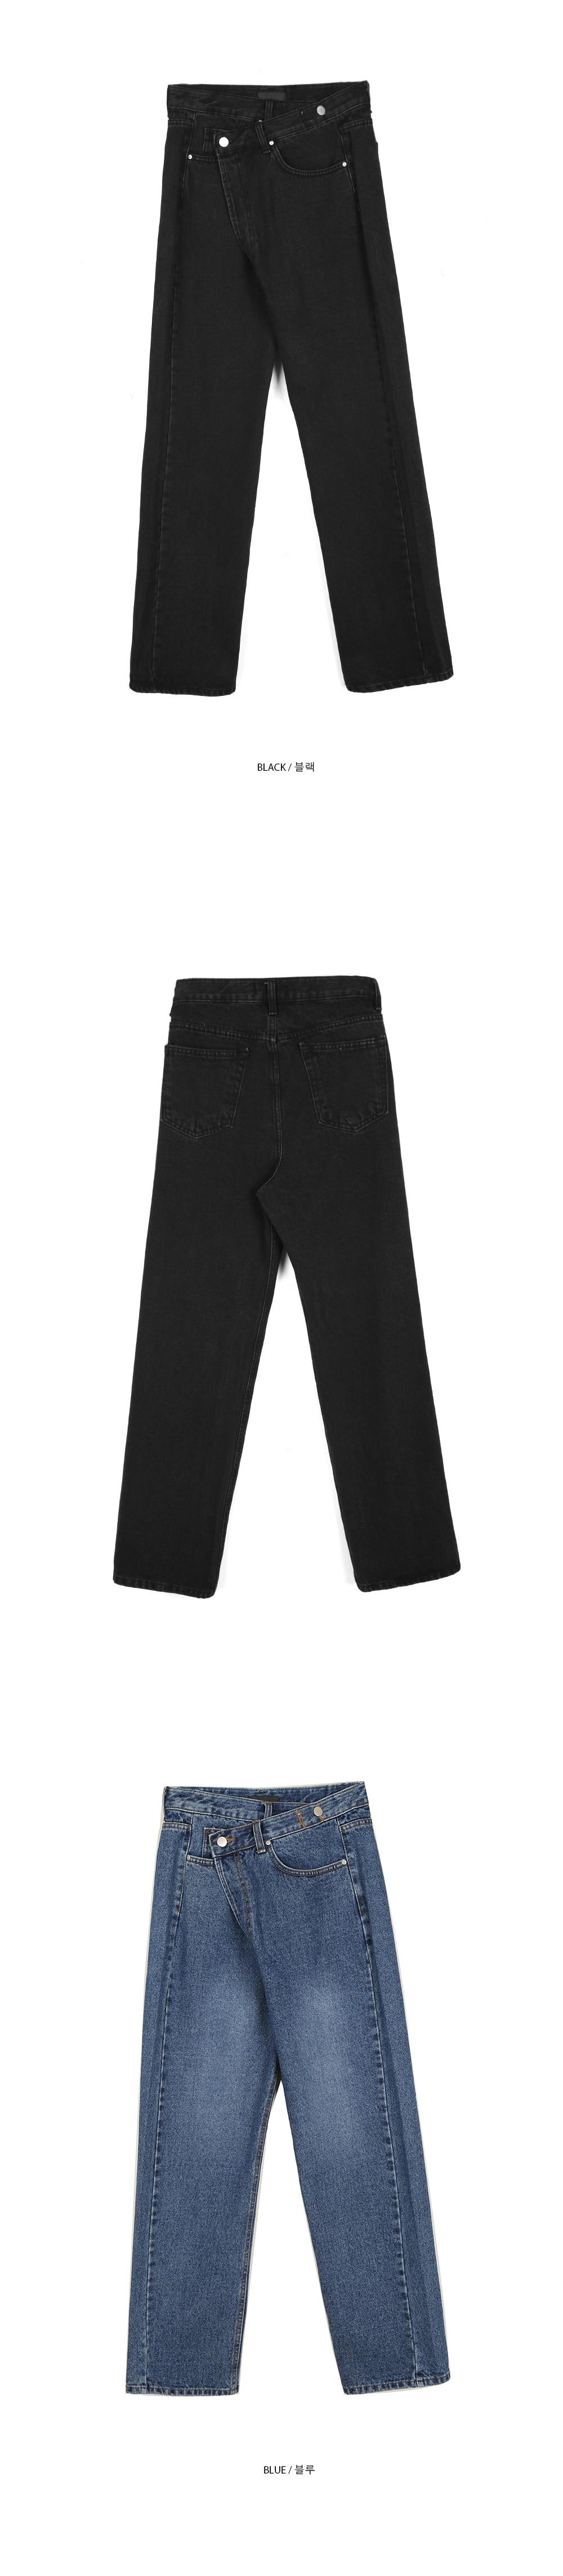 unbalanced lab jeans (2 color) - woman